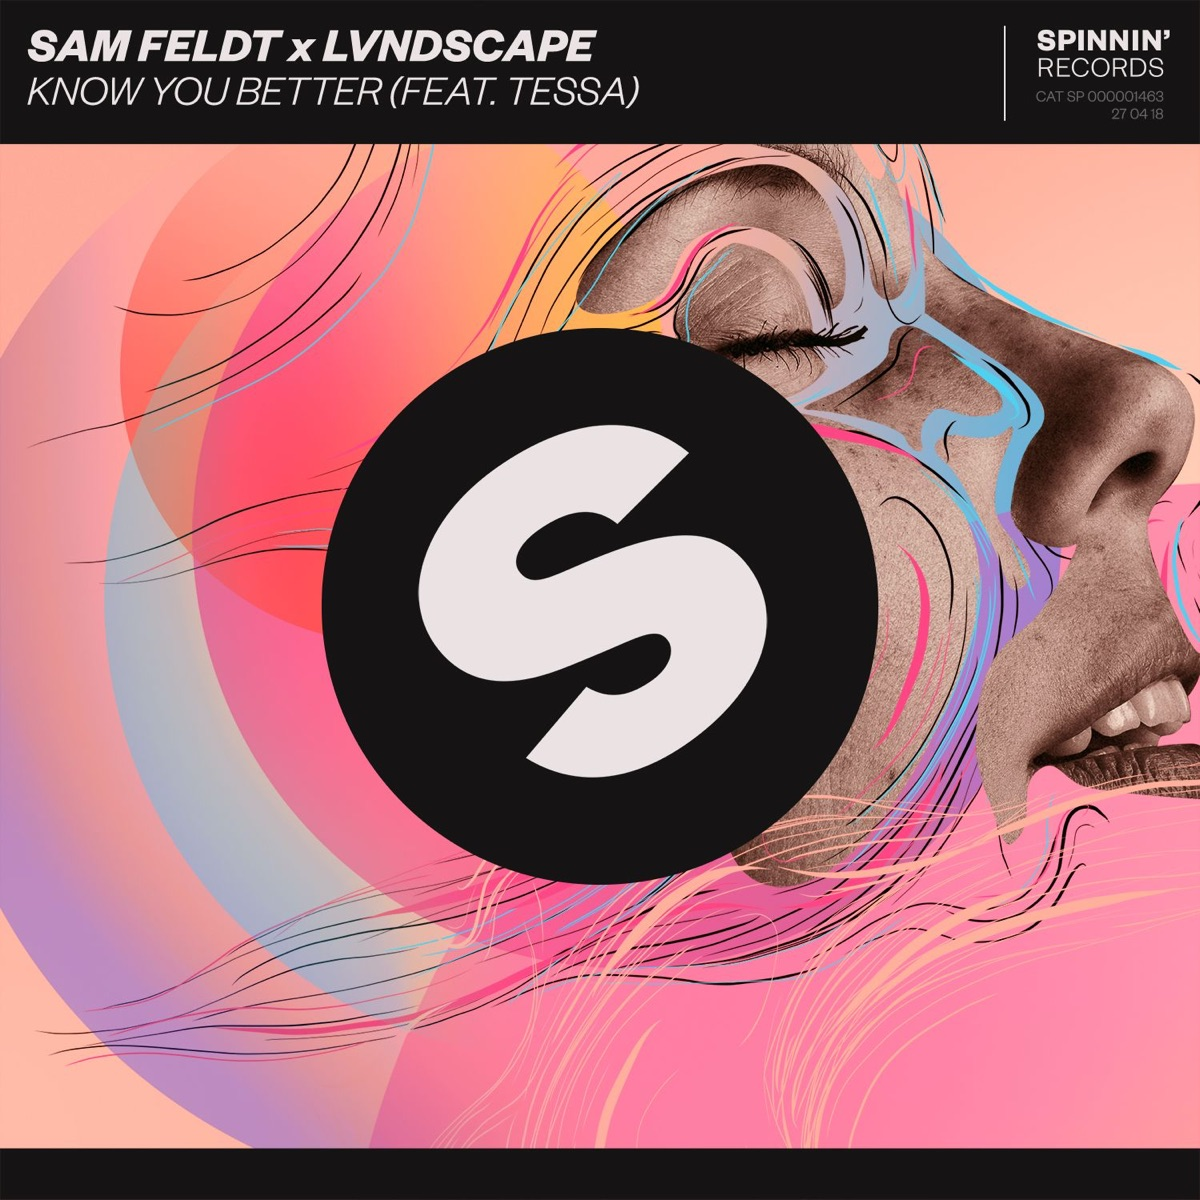 Know You Better Album Cover by Sam Feldt & LVNDSCAPE